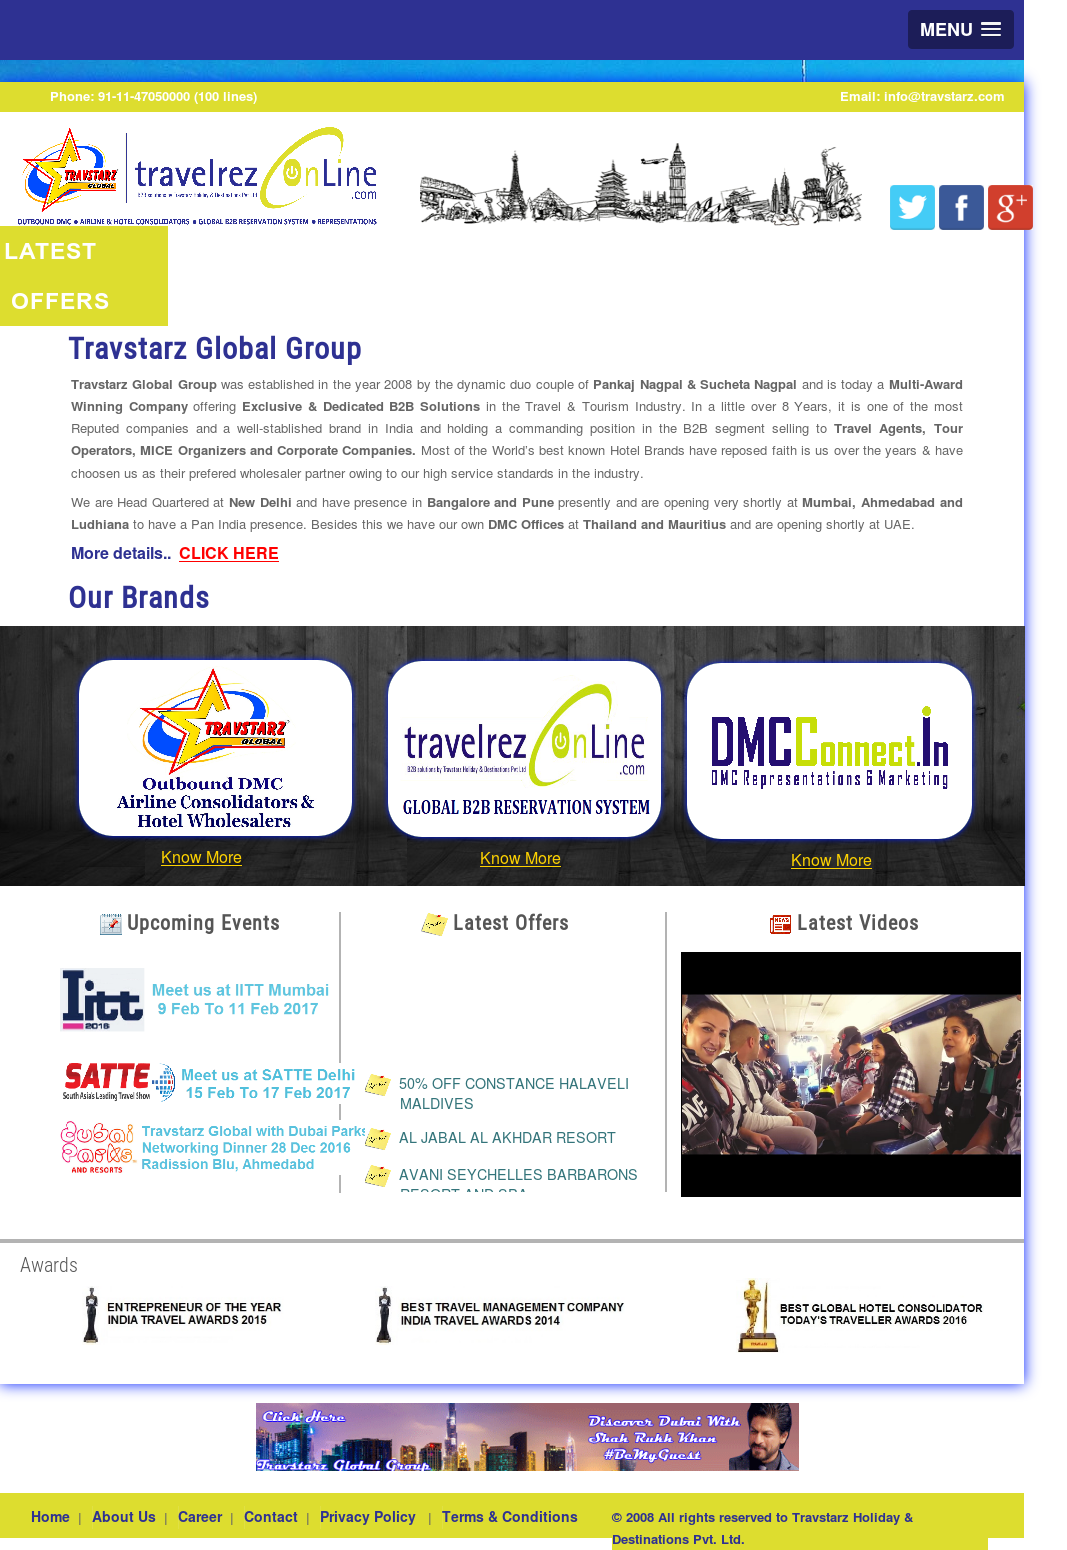 Travstarz Holiday & Destinations Competitors, Revenue and